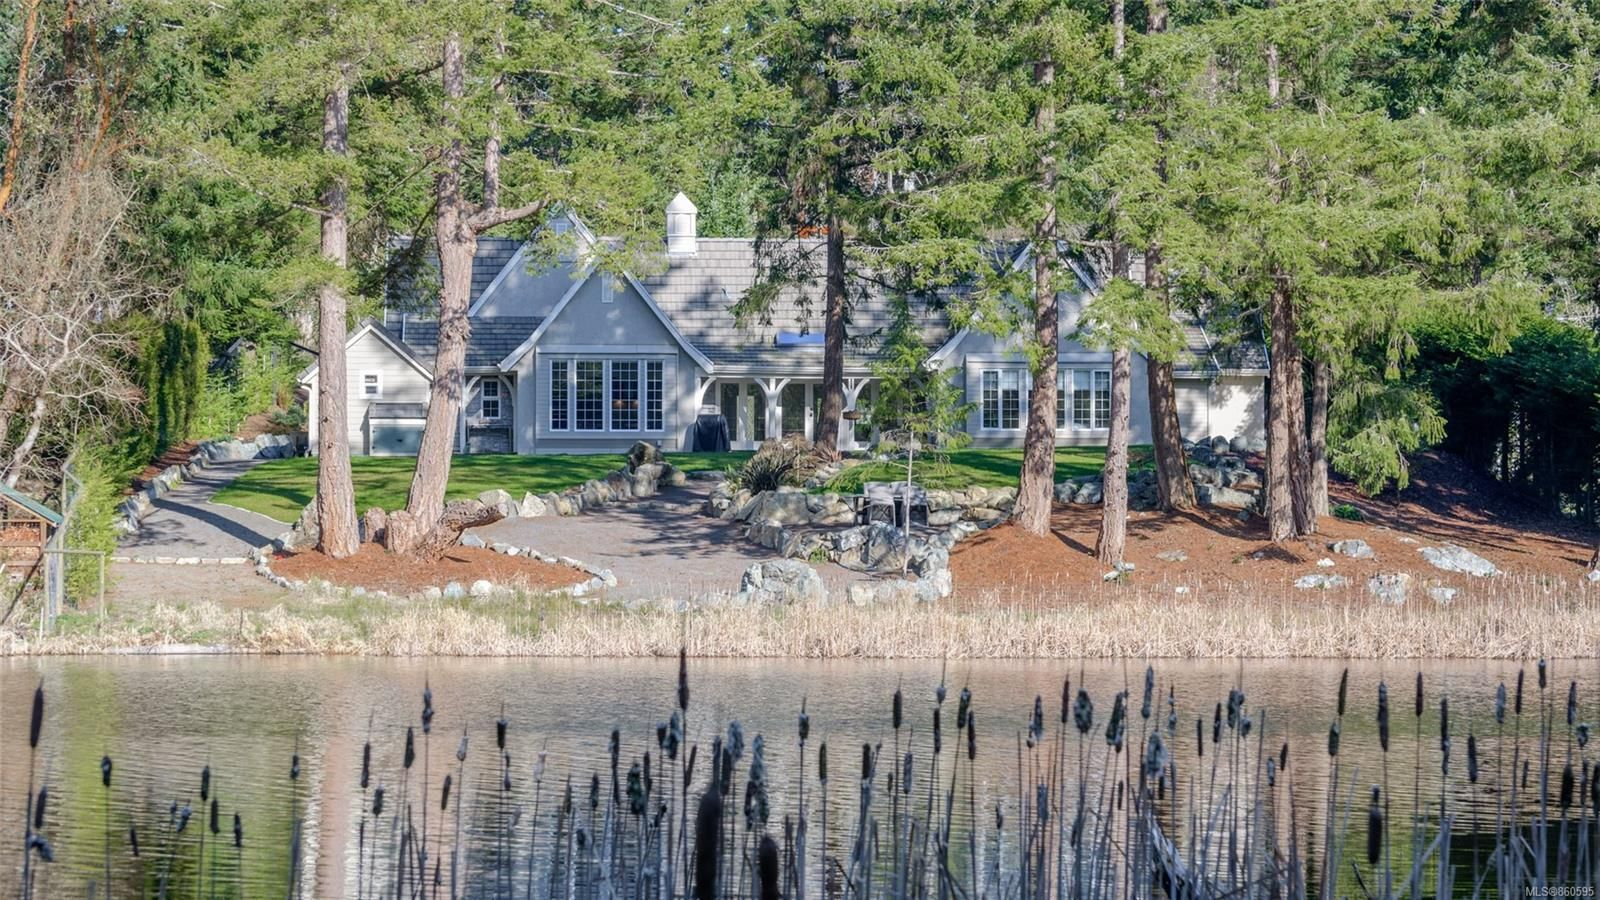 Main Photo: 3318 Rockhampton Road in Nanaimo: nanoose bay House for sale (nanaimo)  : MLS®# 860595